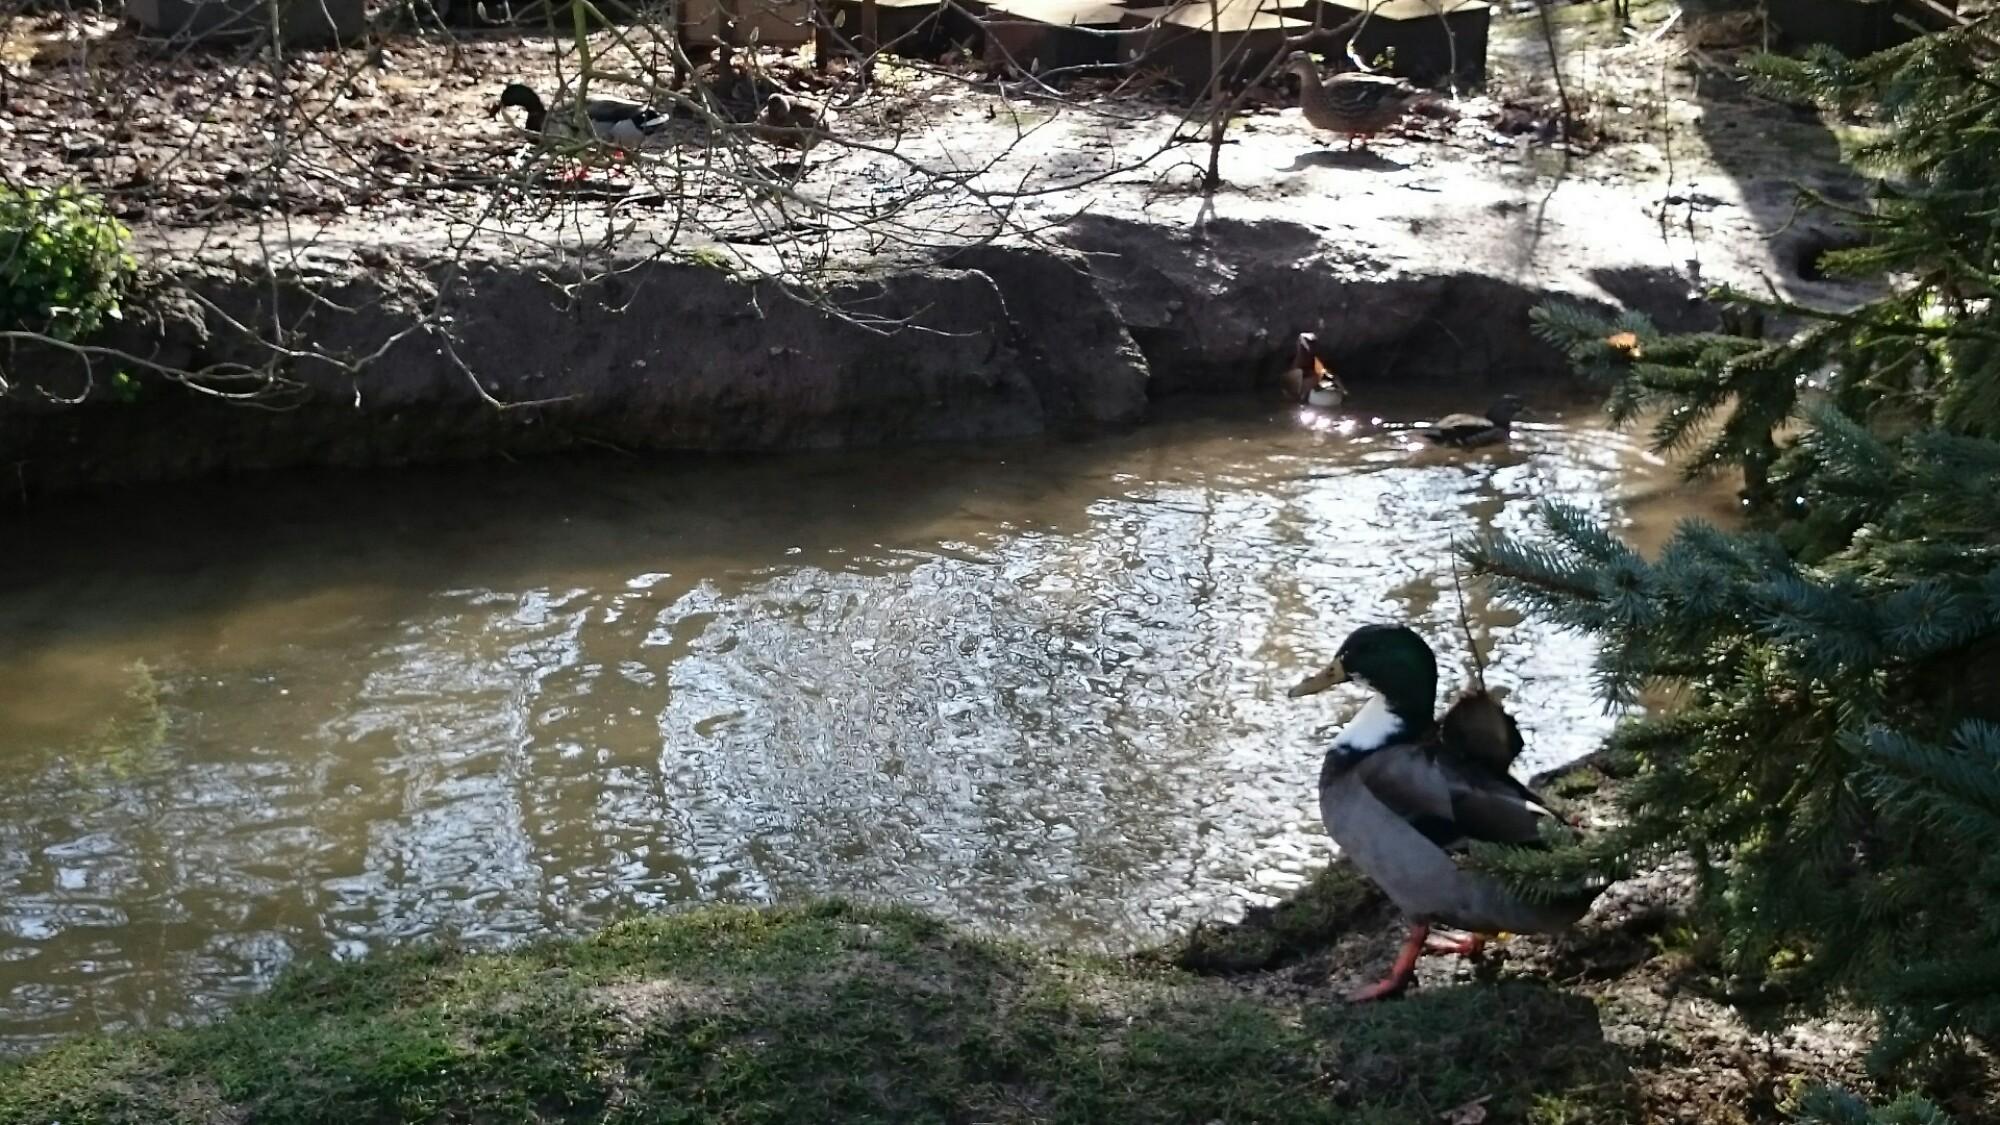 Ducks at pond in rural France